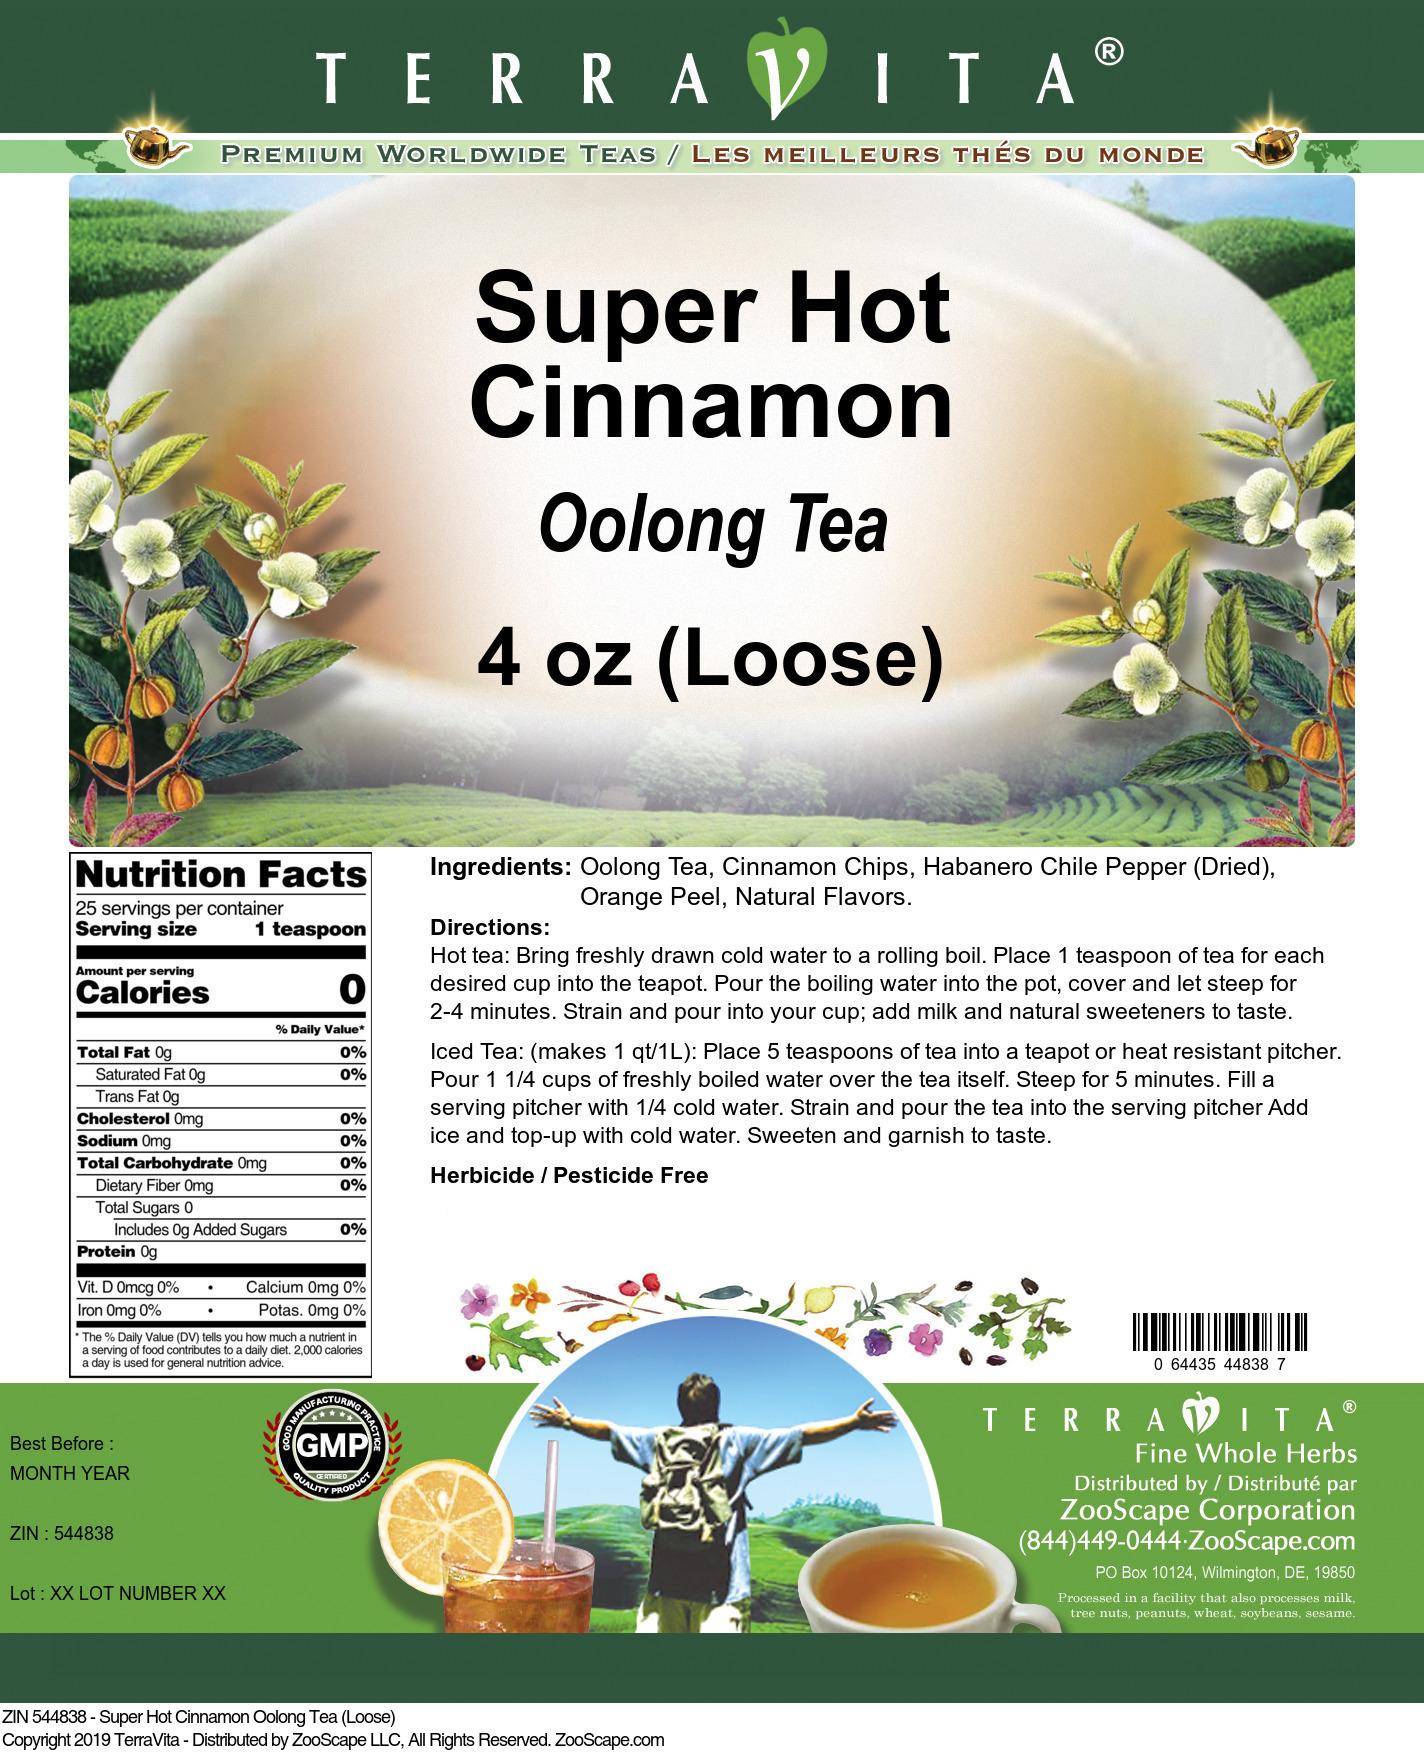 Super Hot Cinnamon Oolong Tea (Loose)